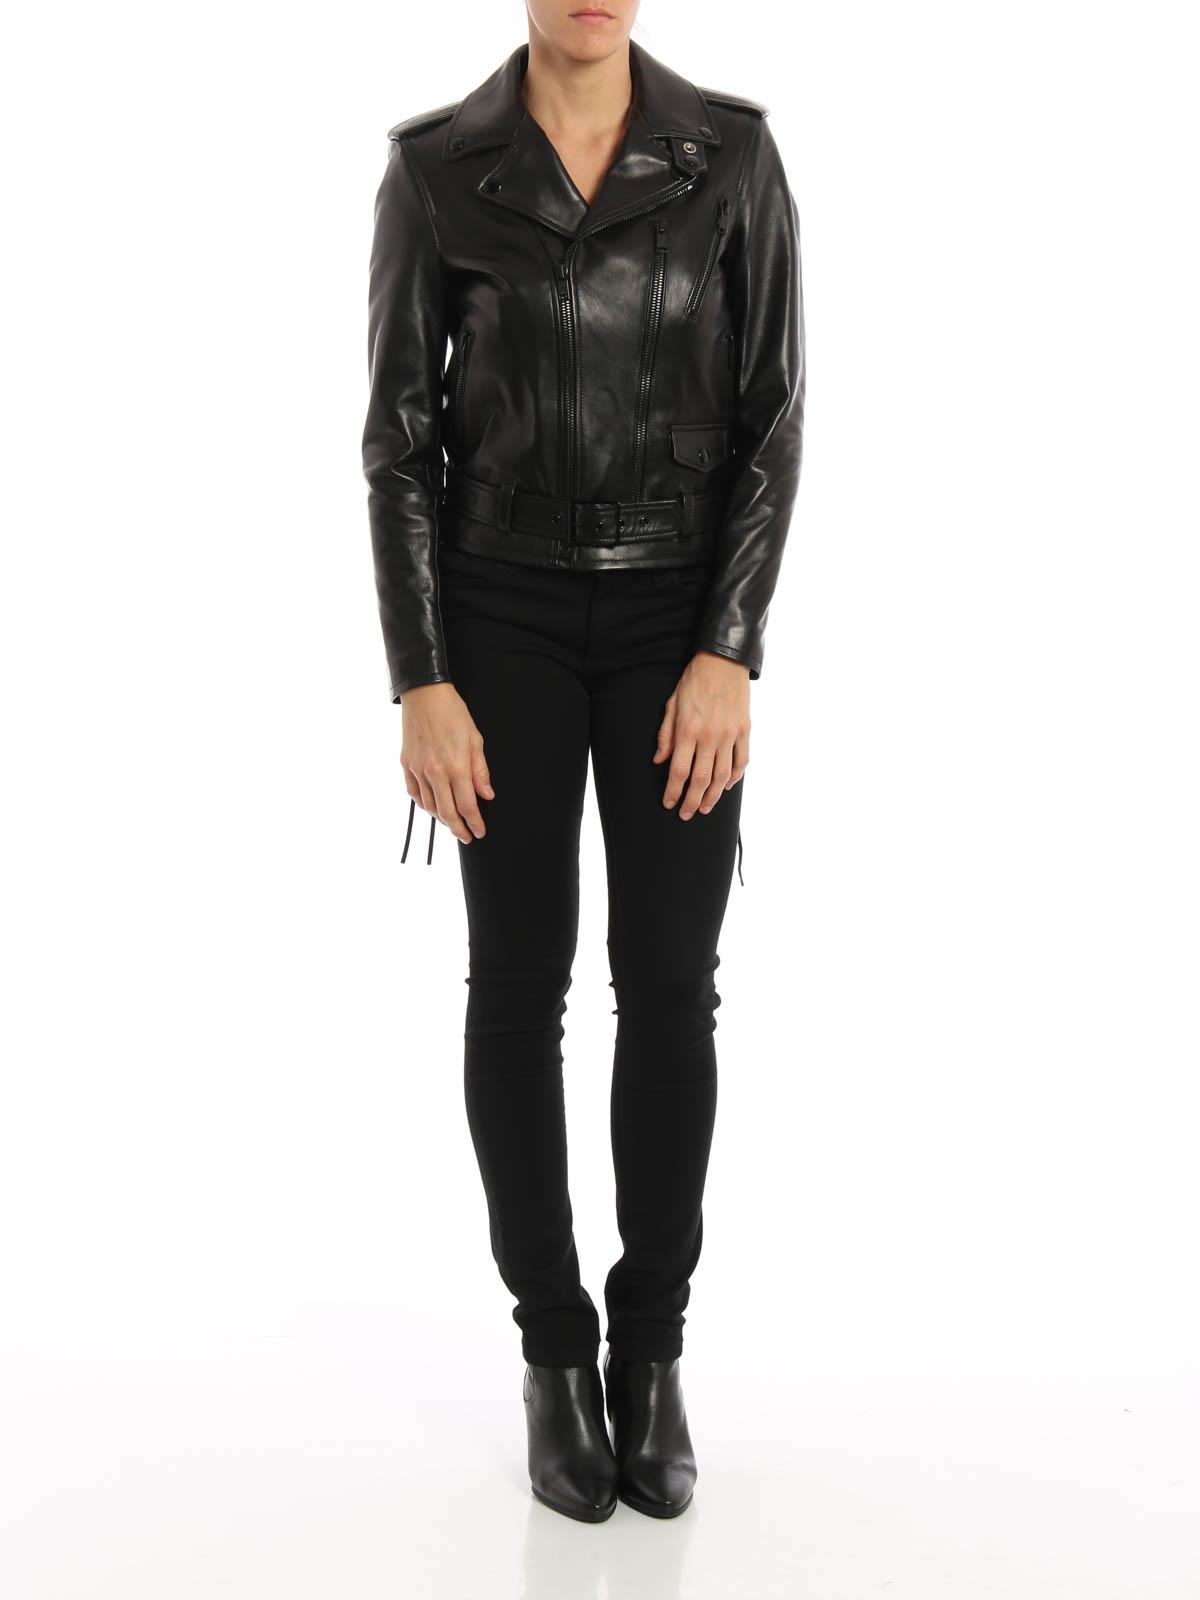 71cc9ef1138c Saint Laurent - Belted leather jacket - leather jacket - 442456 ...